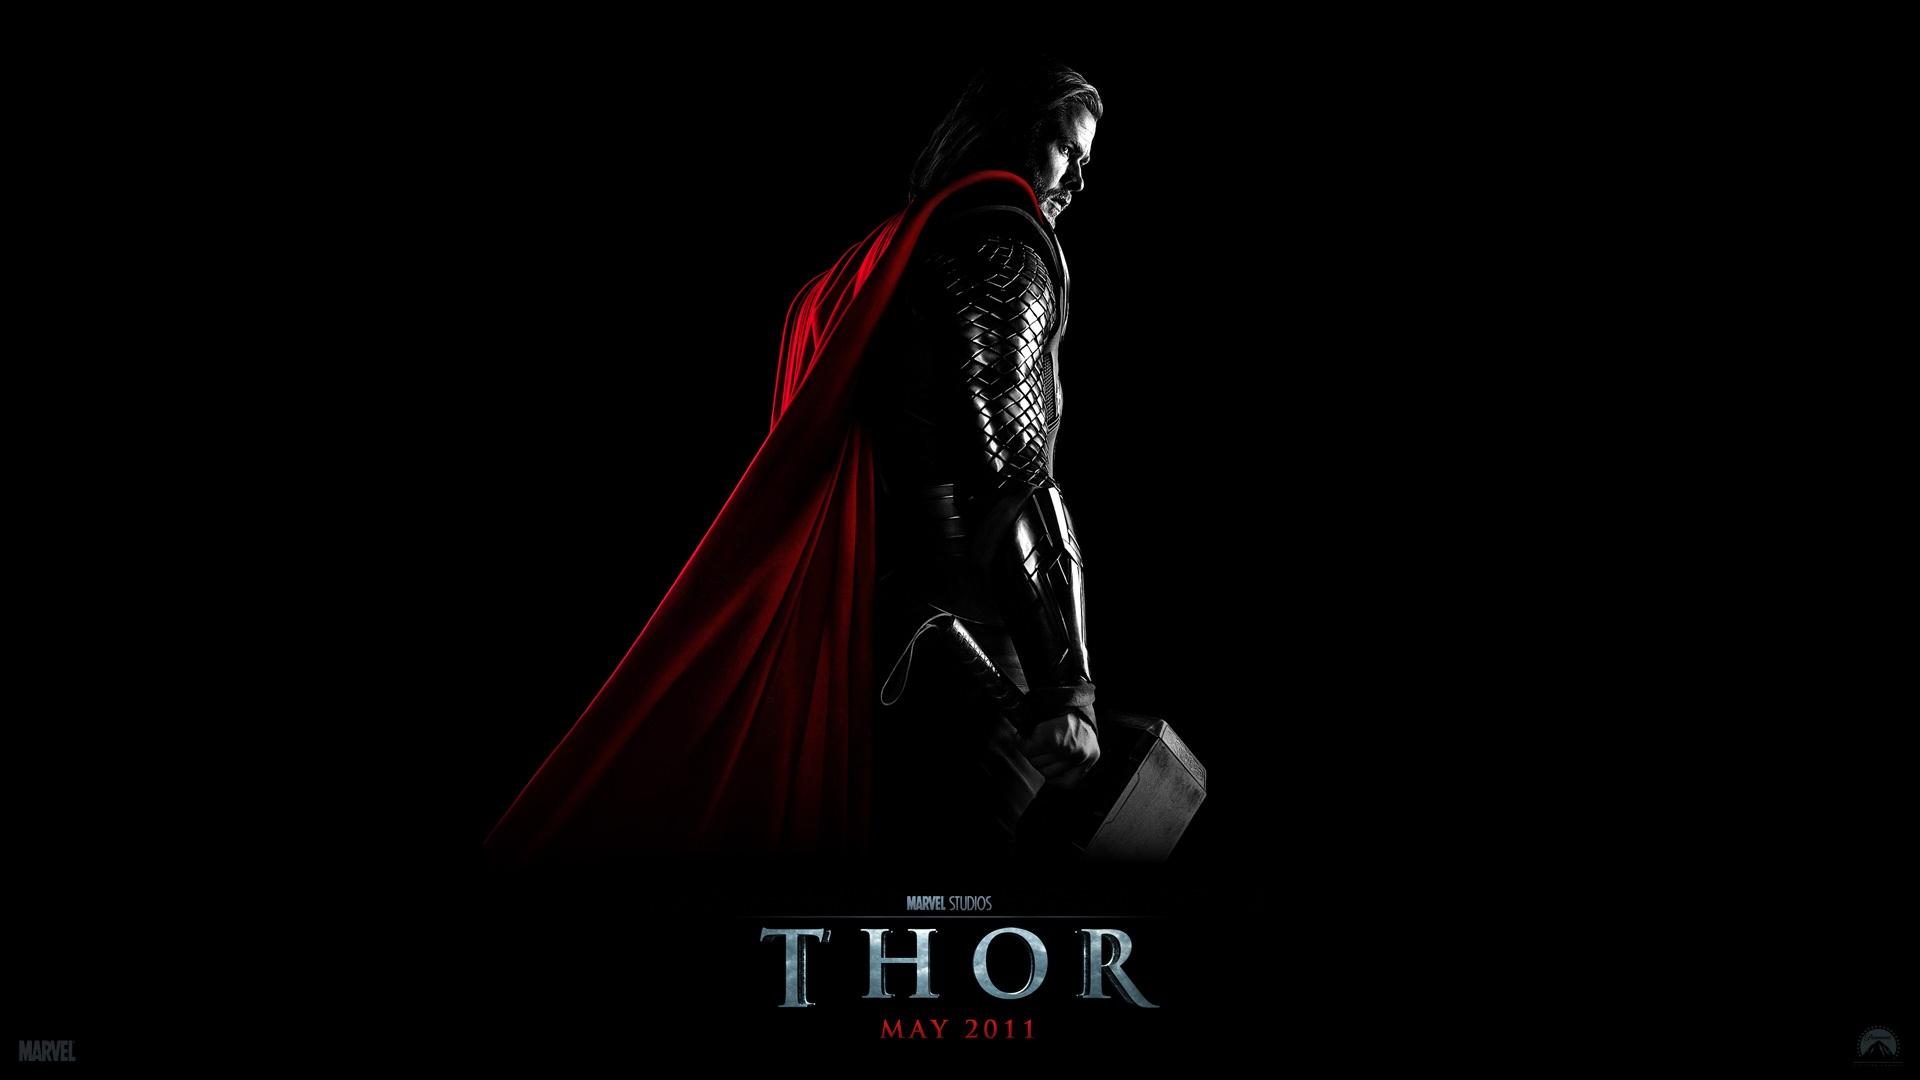 Thor wallpaper 1